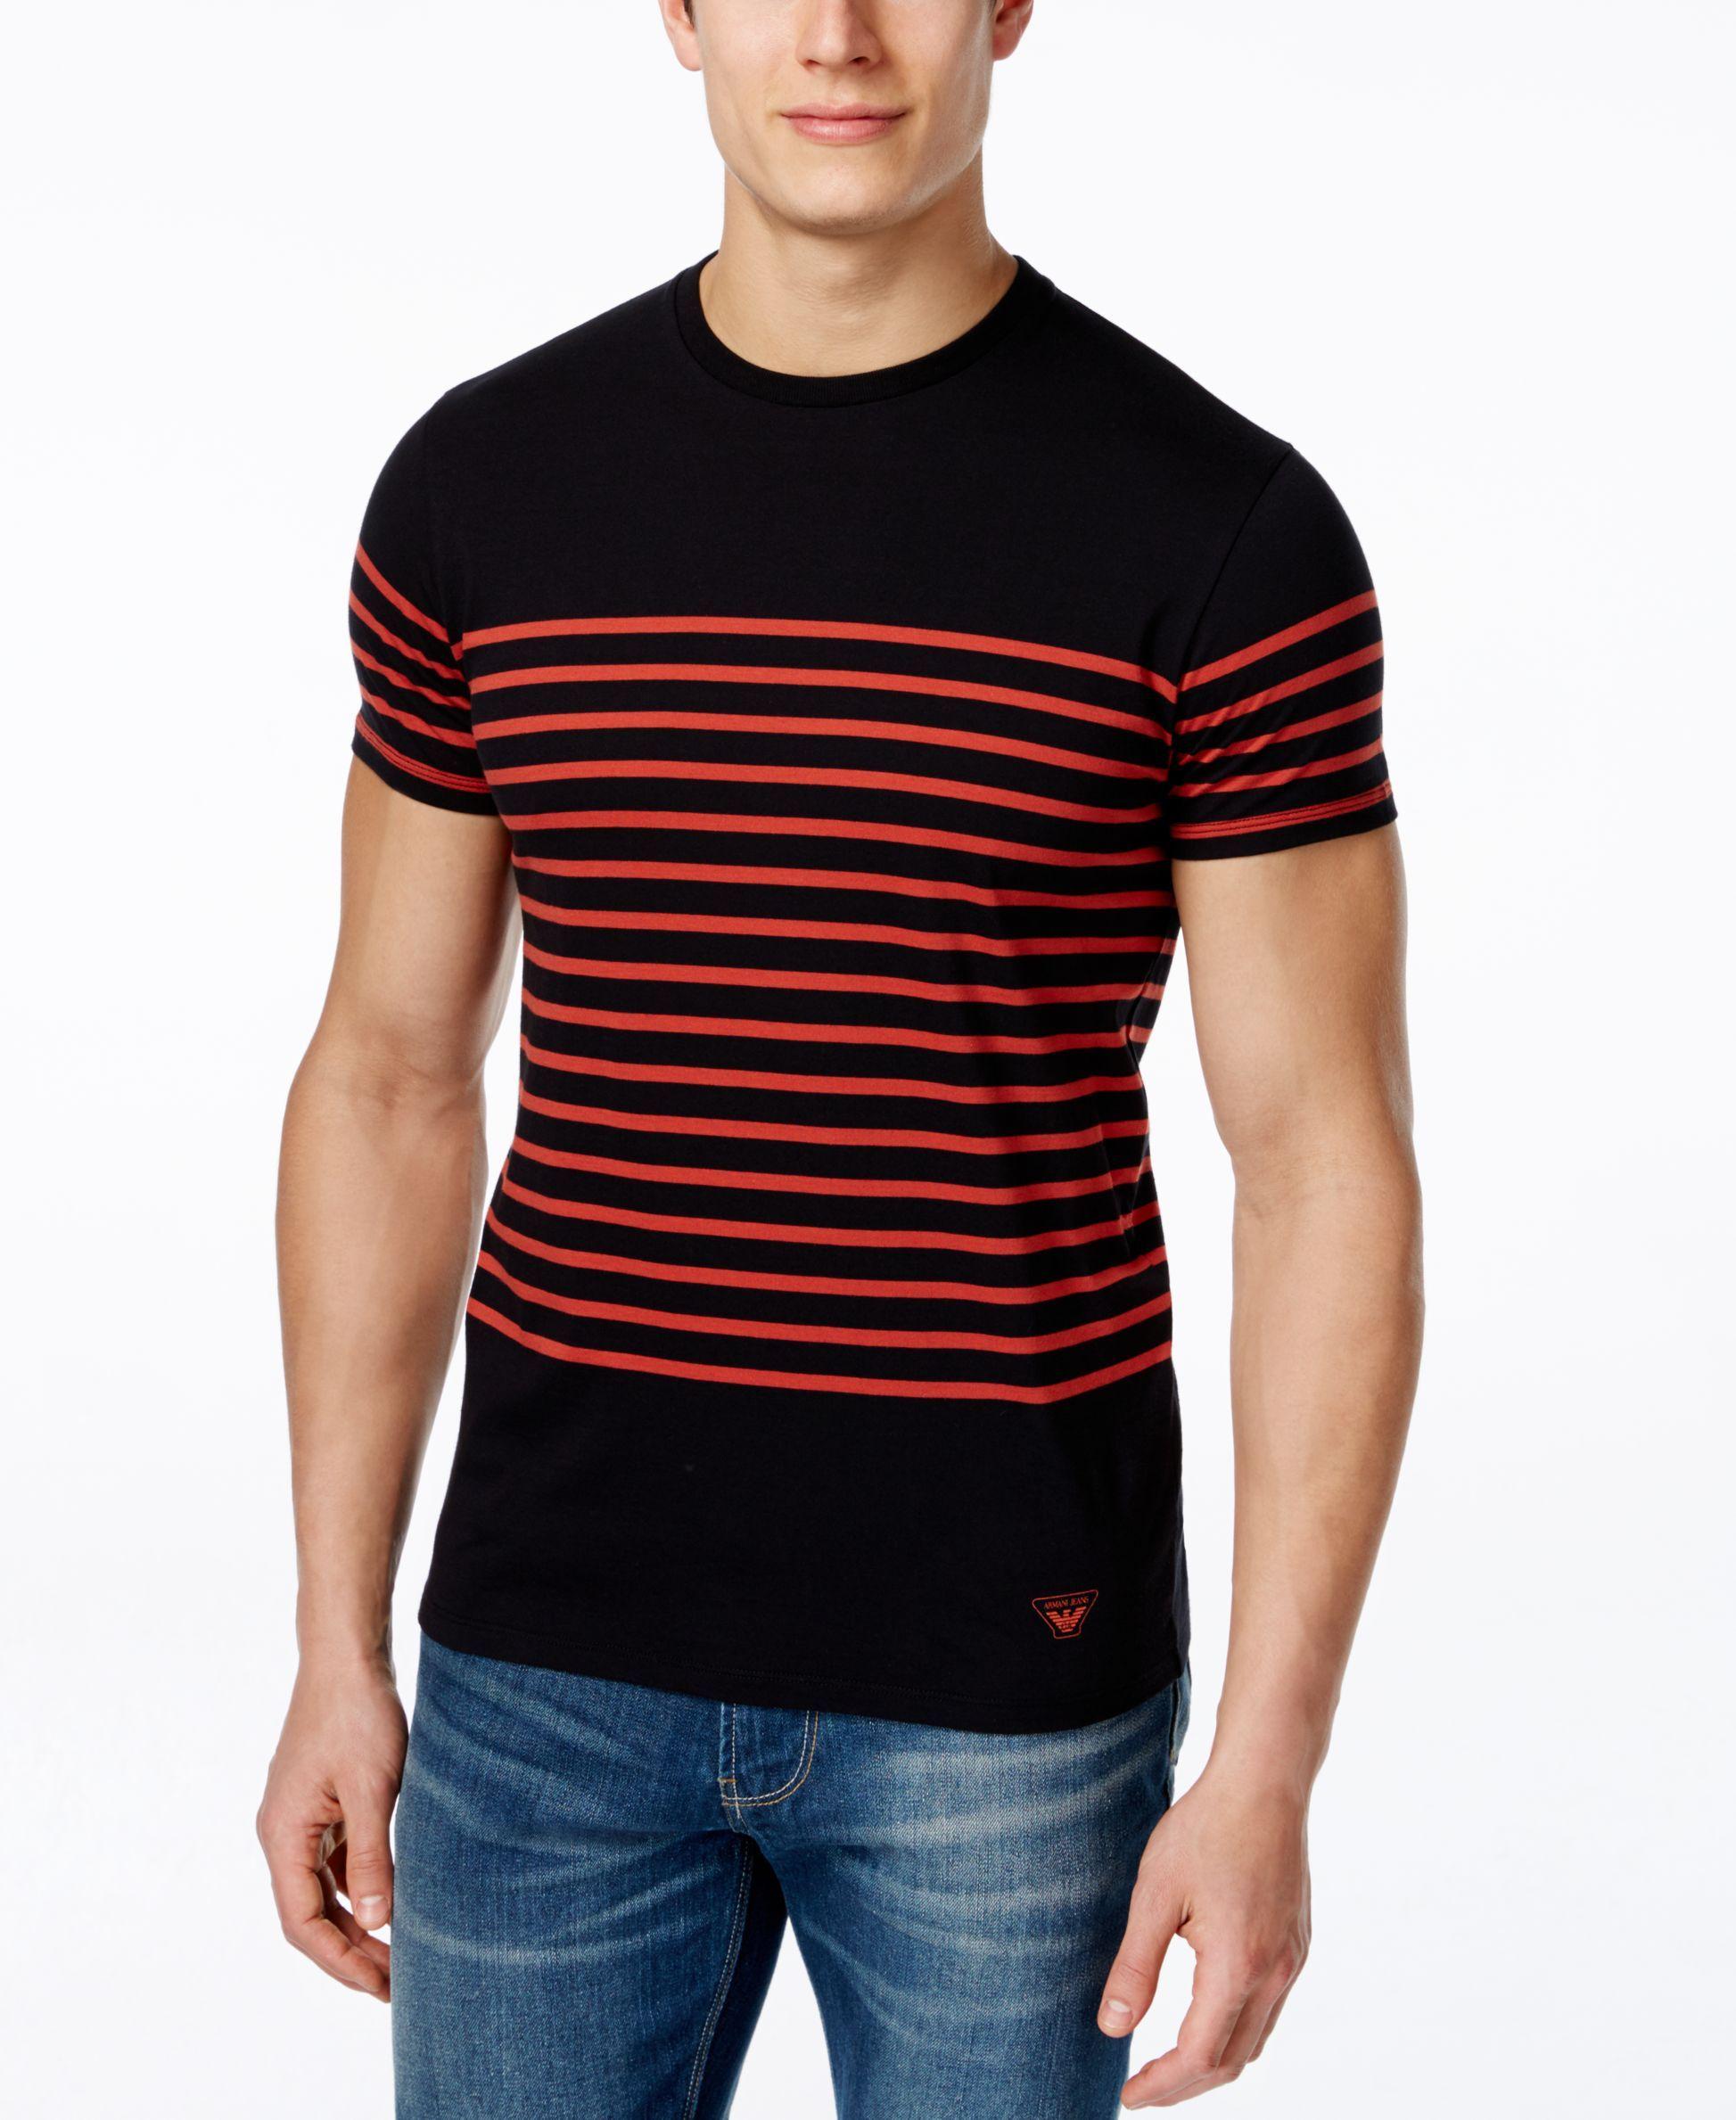 9c65644a Mens Armani Jeans T Shirt - DREAMWORKS